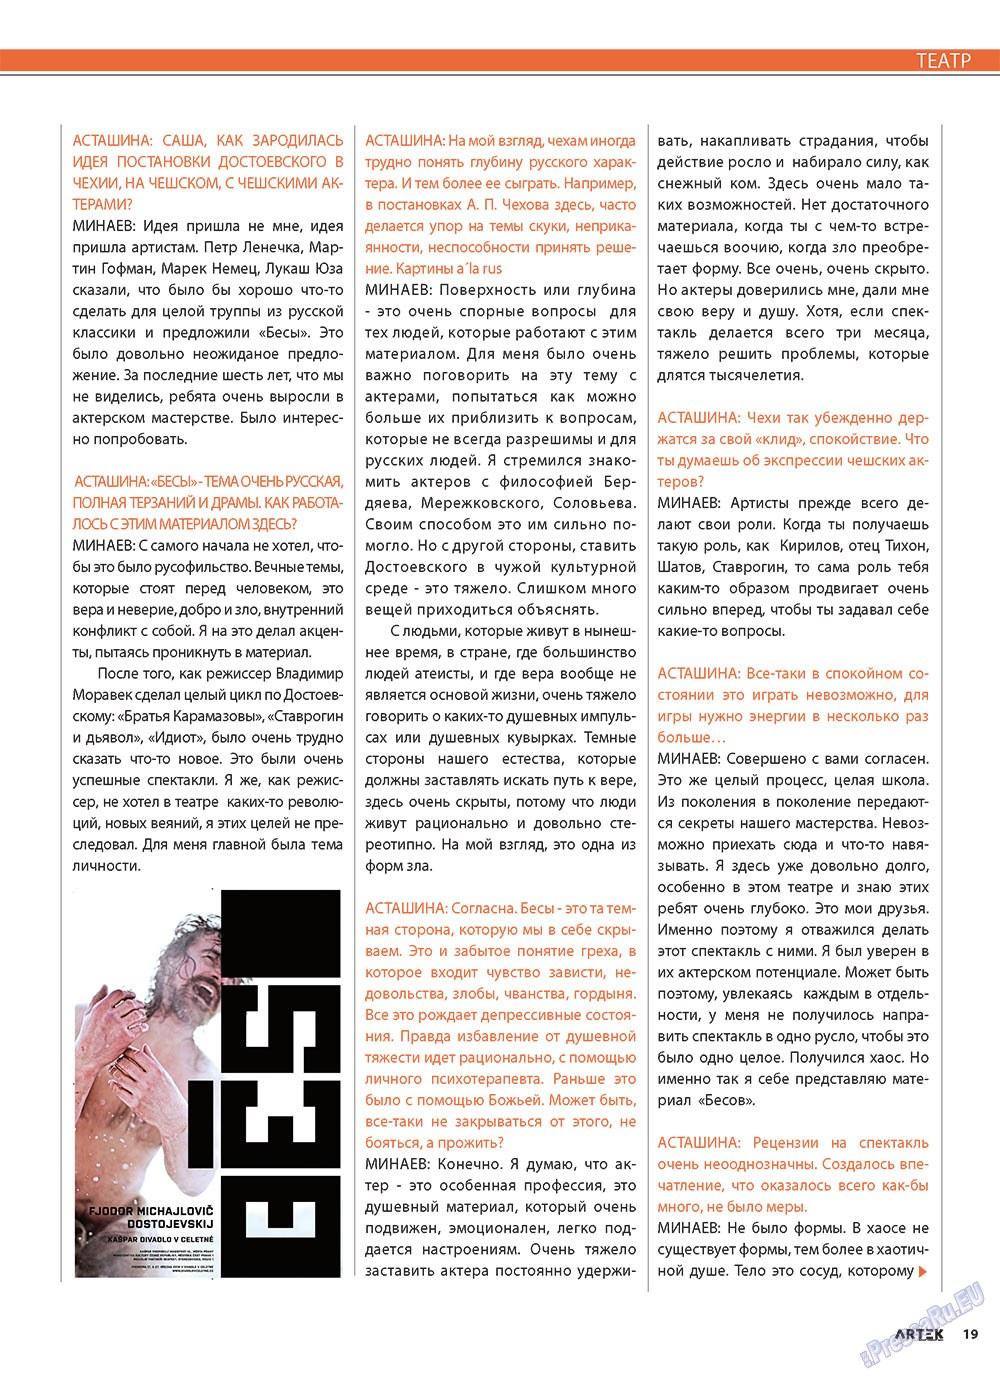 Артек (журнал). 2010 год, номер 4, стр. 21